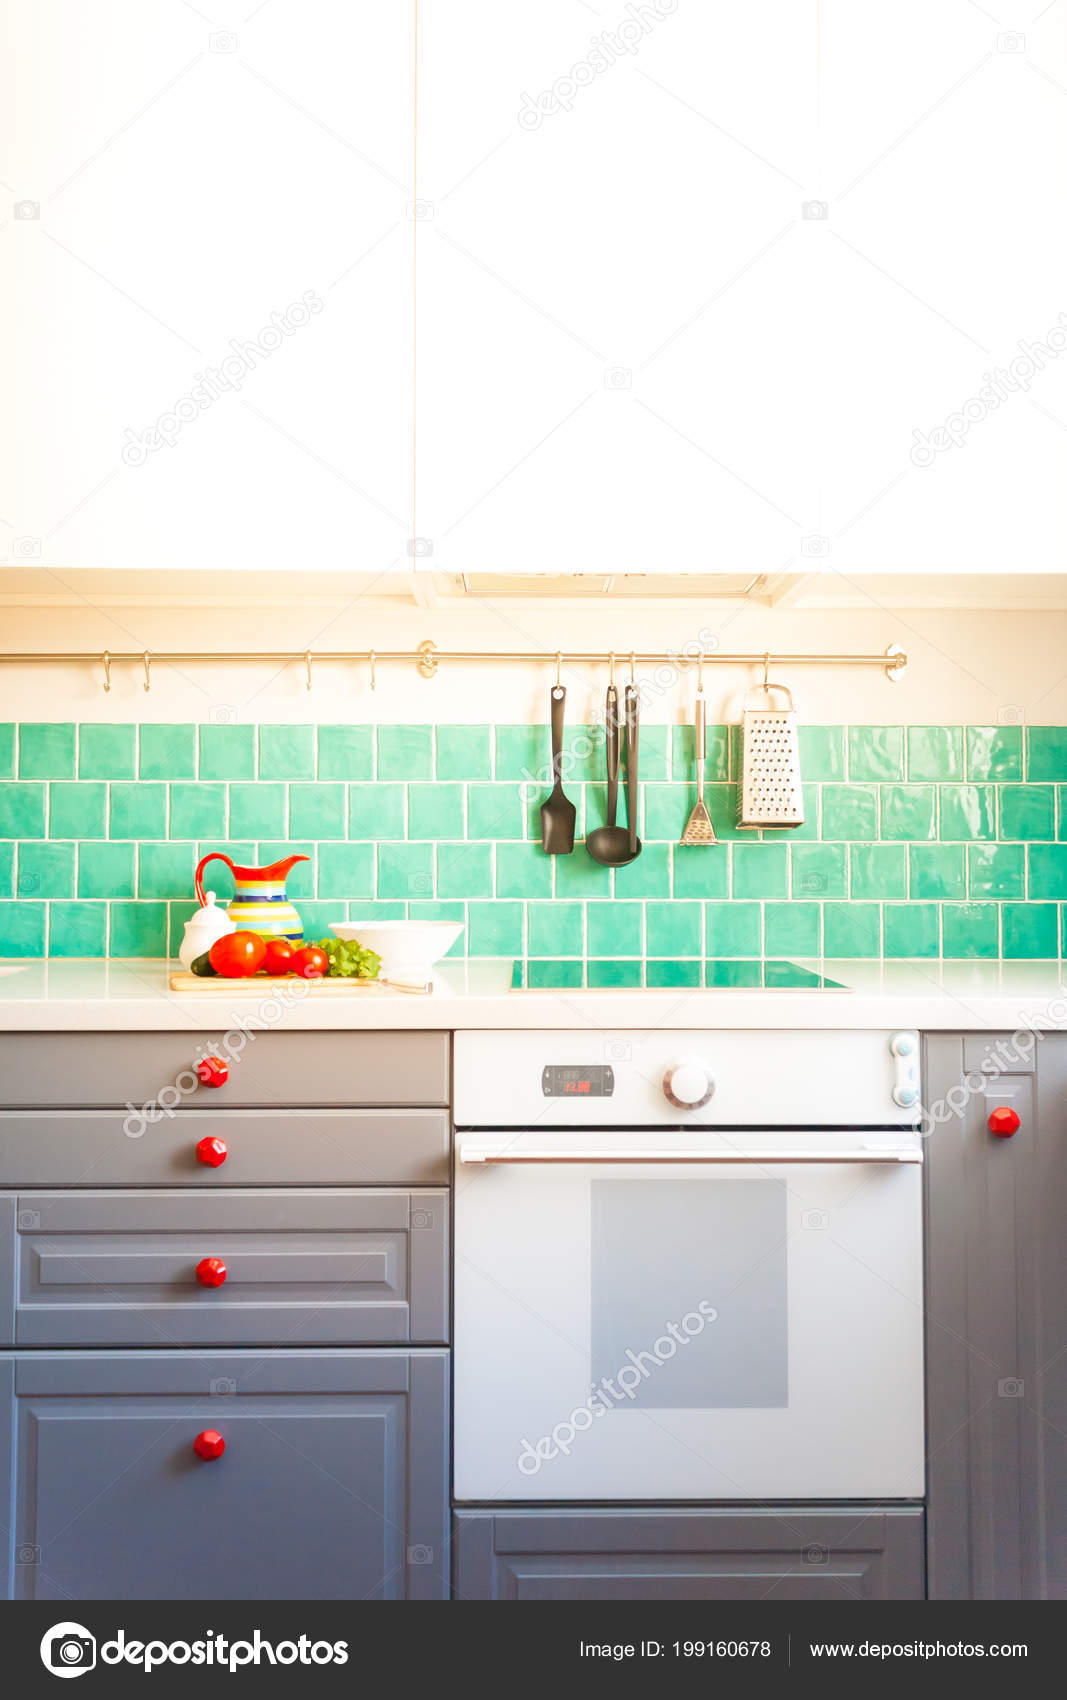 grey kitchen tile outdoor kitchens naples 现代灰色厨房特色深灰色扁平前柜配对白色石英台面和一个光泽的蓝色护理 现代灰色厨房特色深灰色扁平前柜配对白色石英台面和一个光泽的蓝色护理瓷砖 照片作者masalskaya